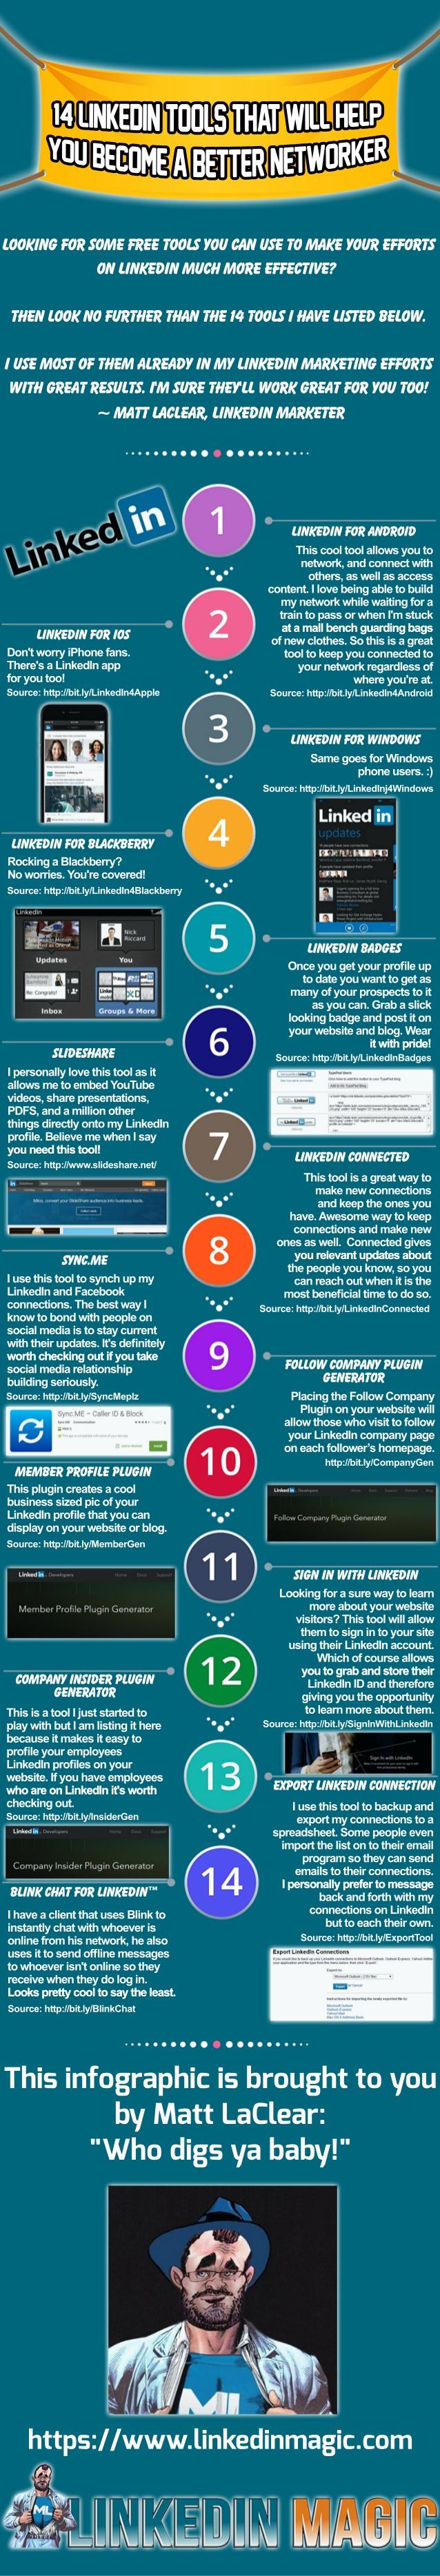 14 herramientas gratuitas para Linkedin